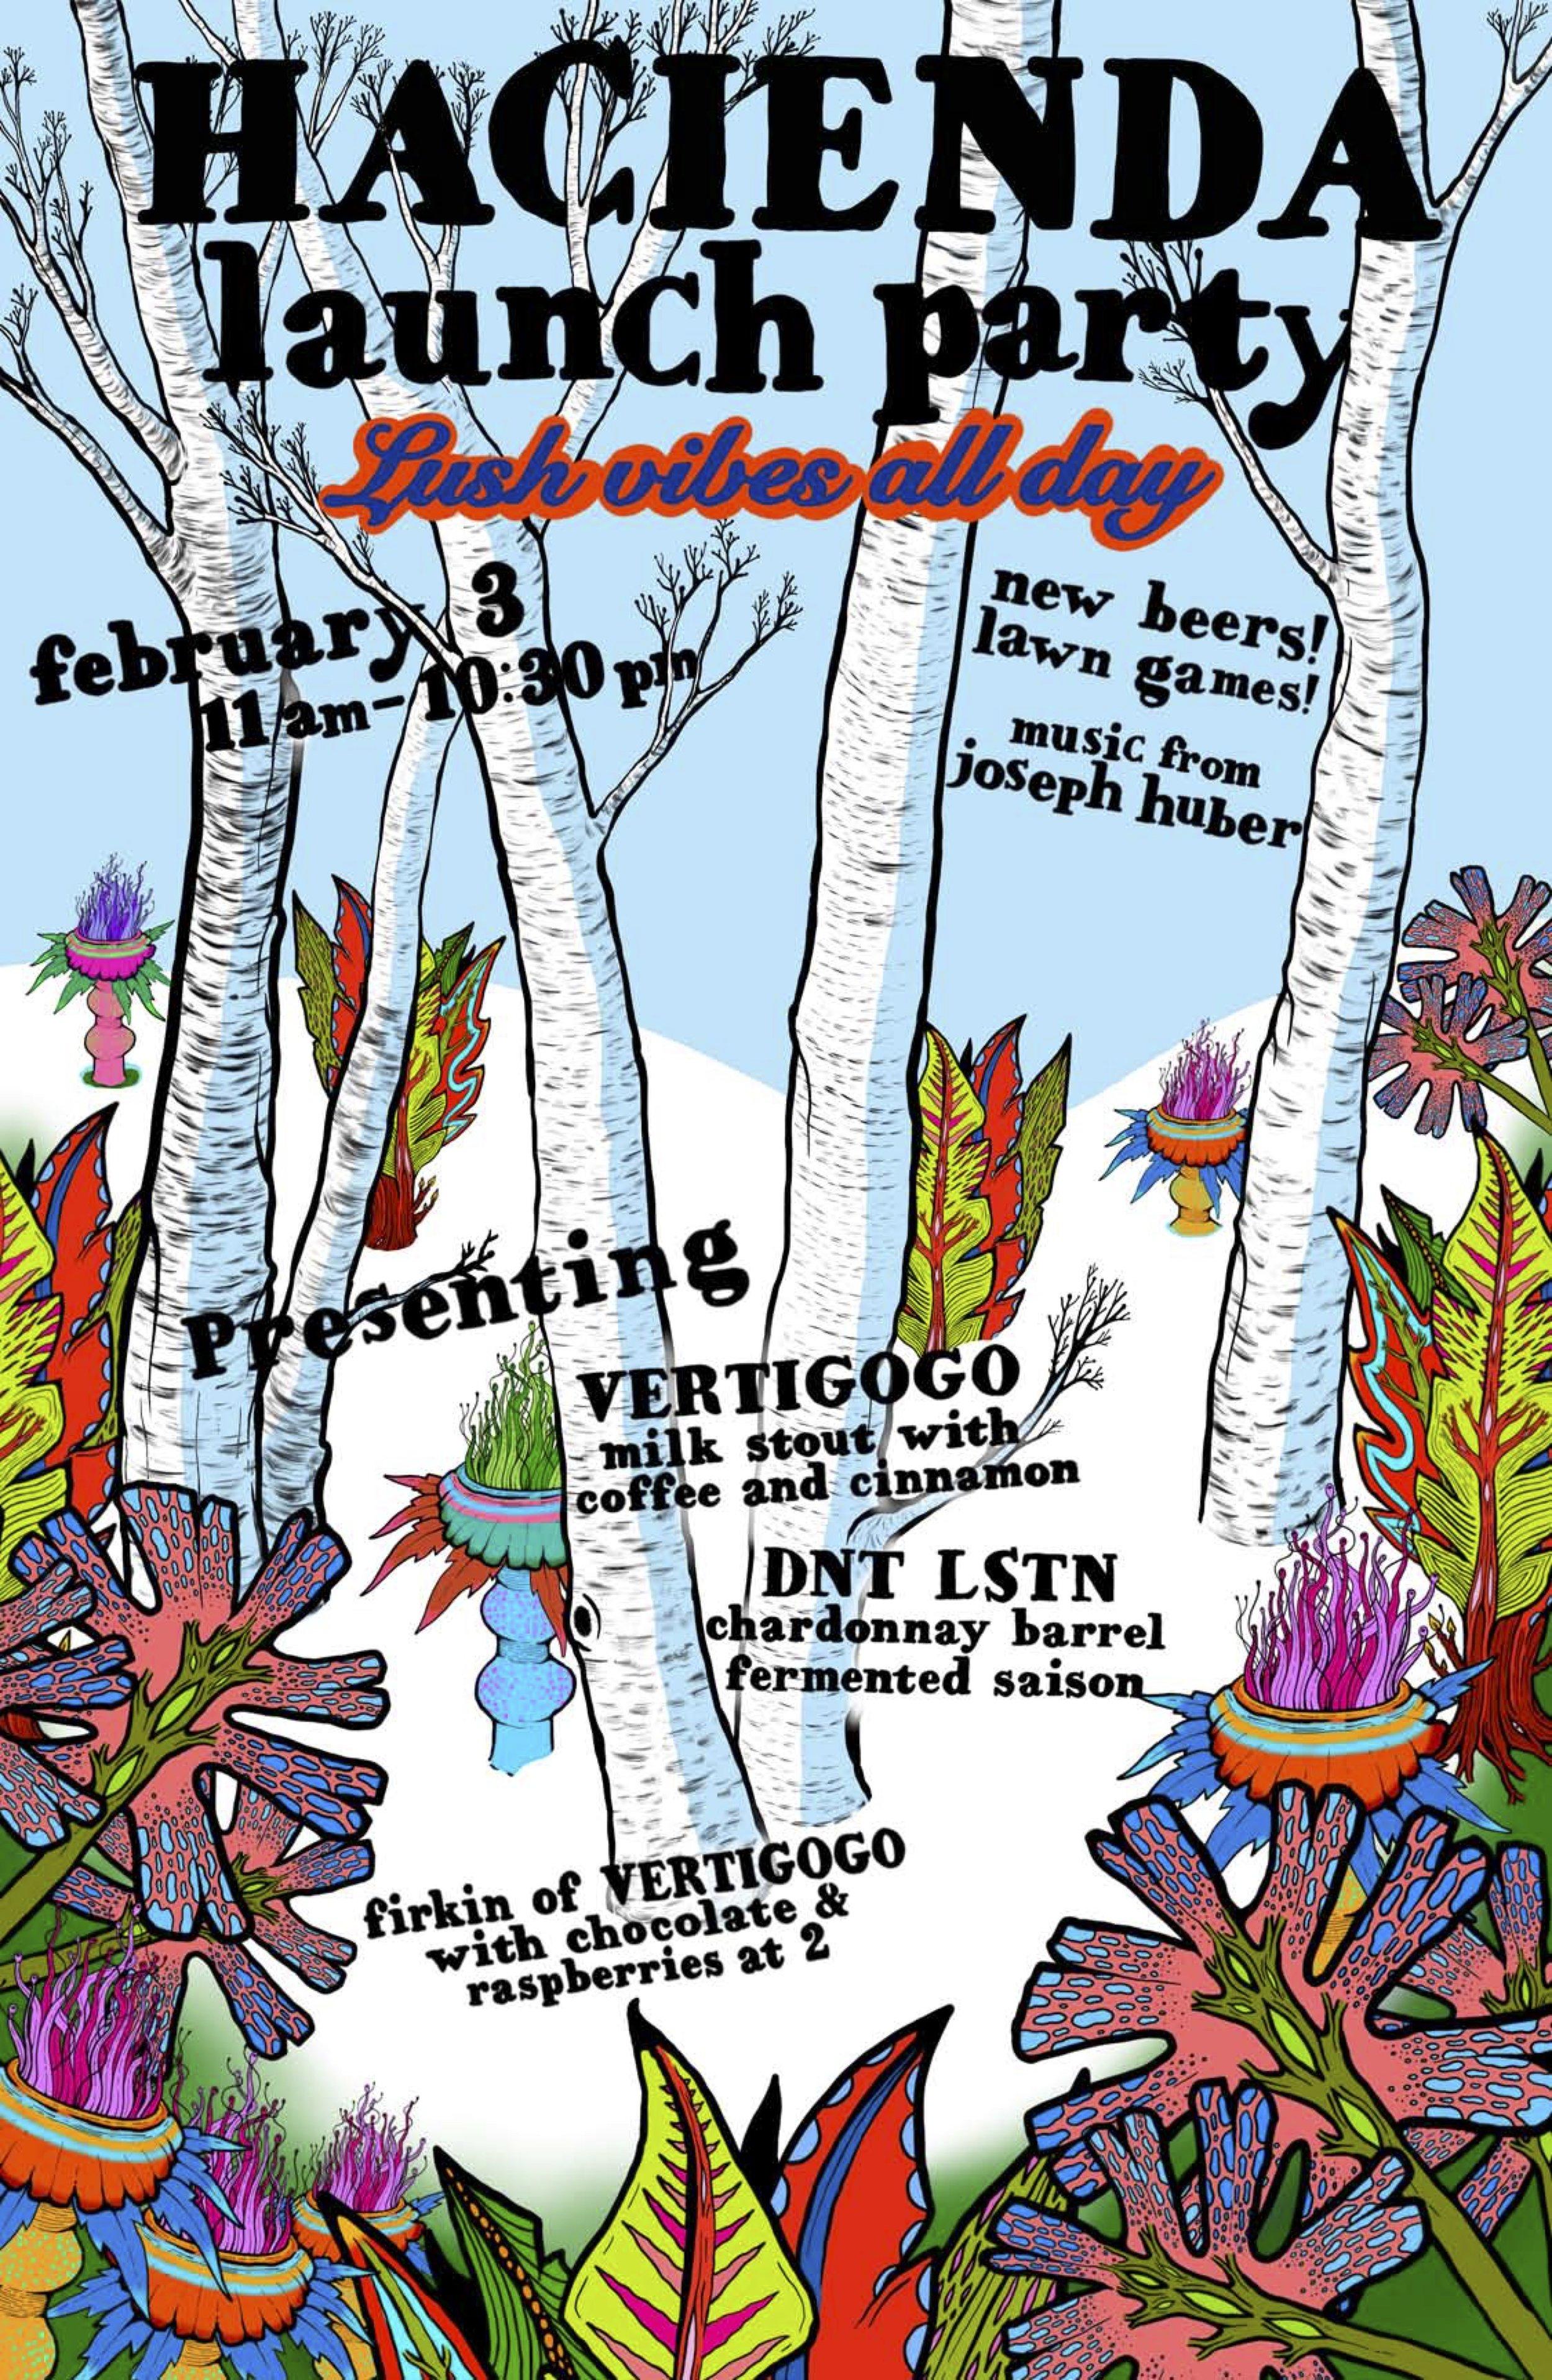 Hacienda-Beer-Co-Launch-Party-Poster.jpg